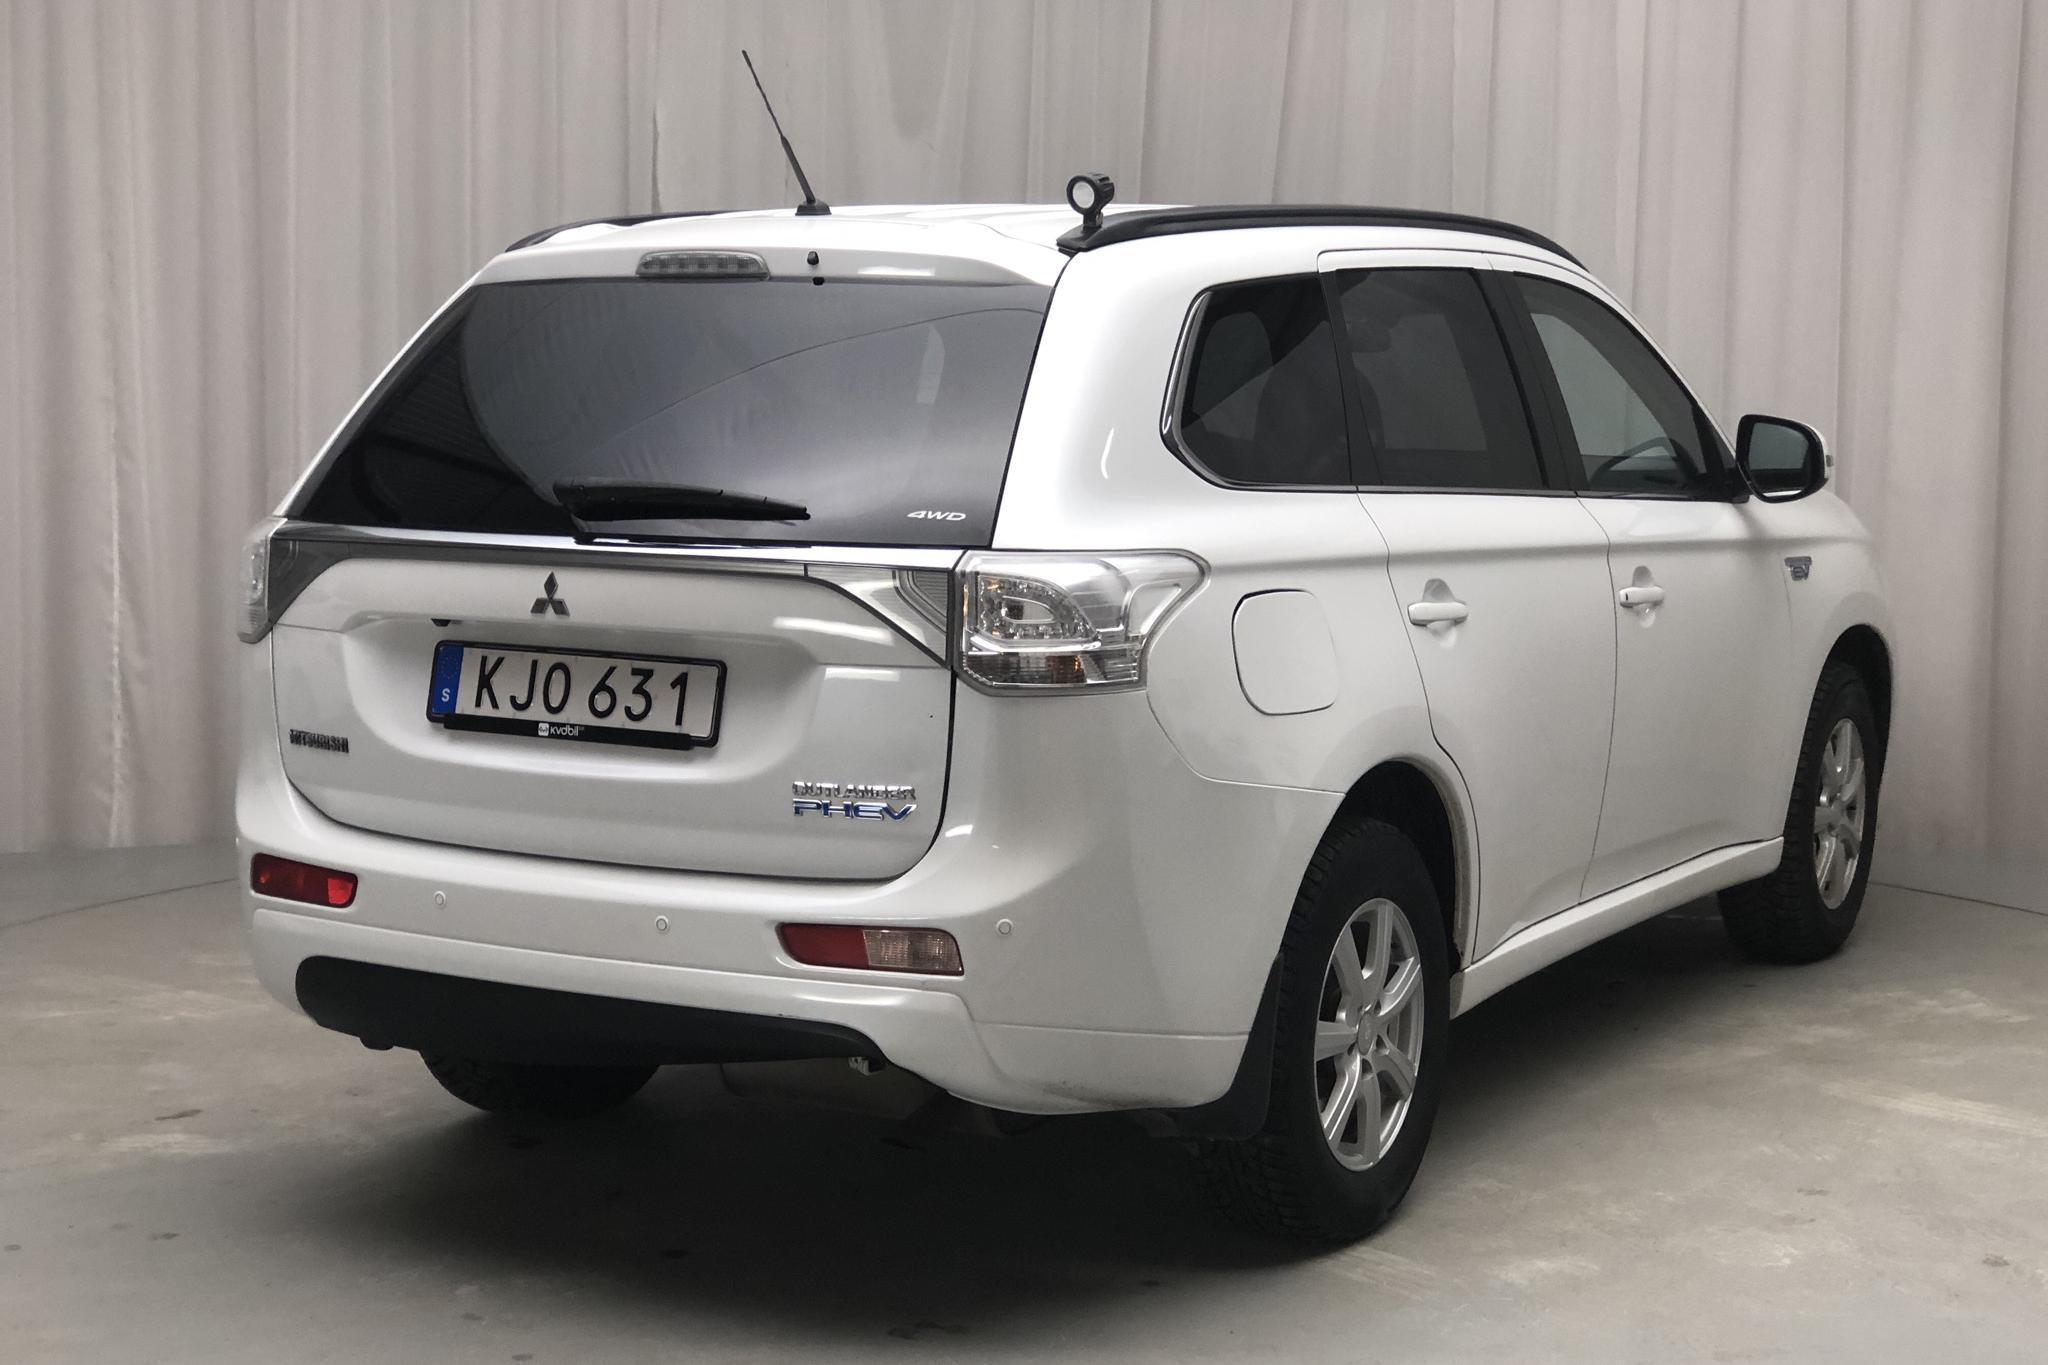 Mitsubishi Outlander 2.0 Plug-in Hybrid 4WD (121hk) - 138 380 km - Automatic - white - 2014